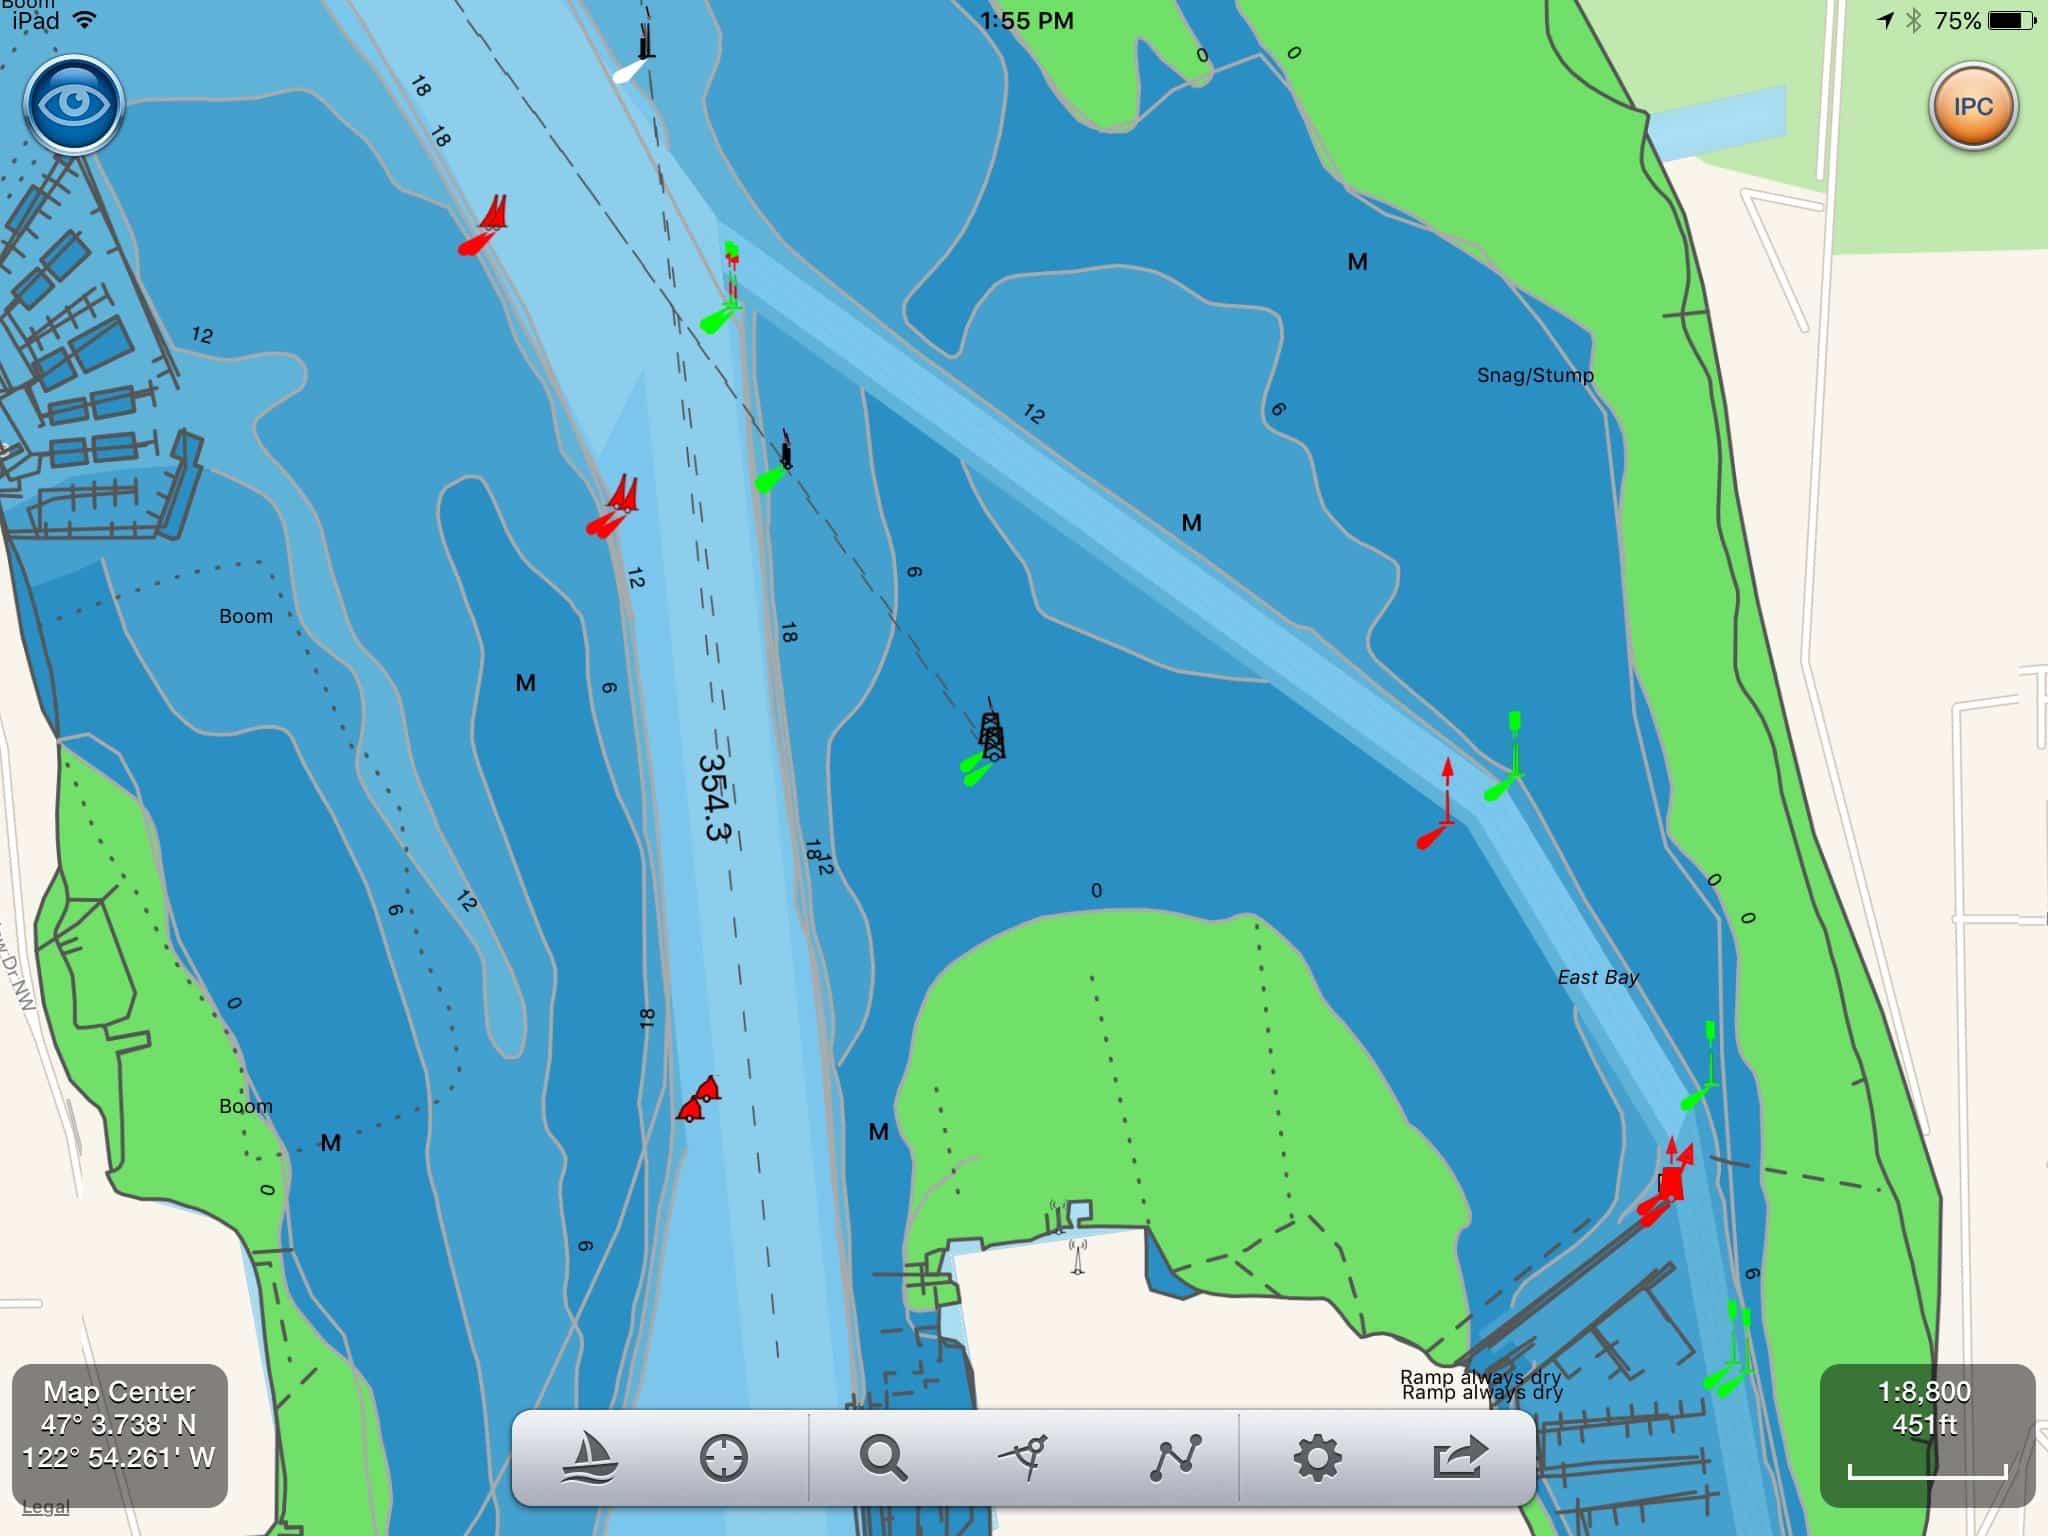 SeaNav US vector charts of same area